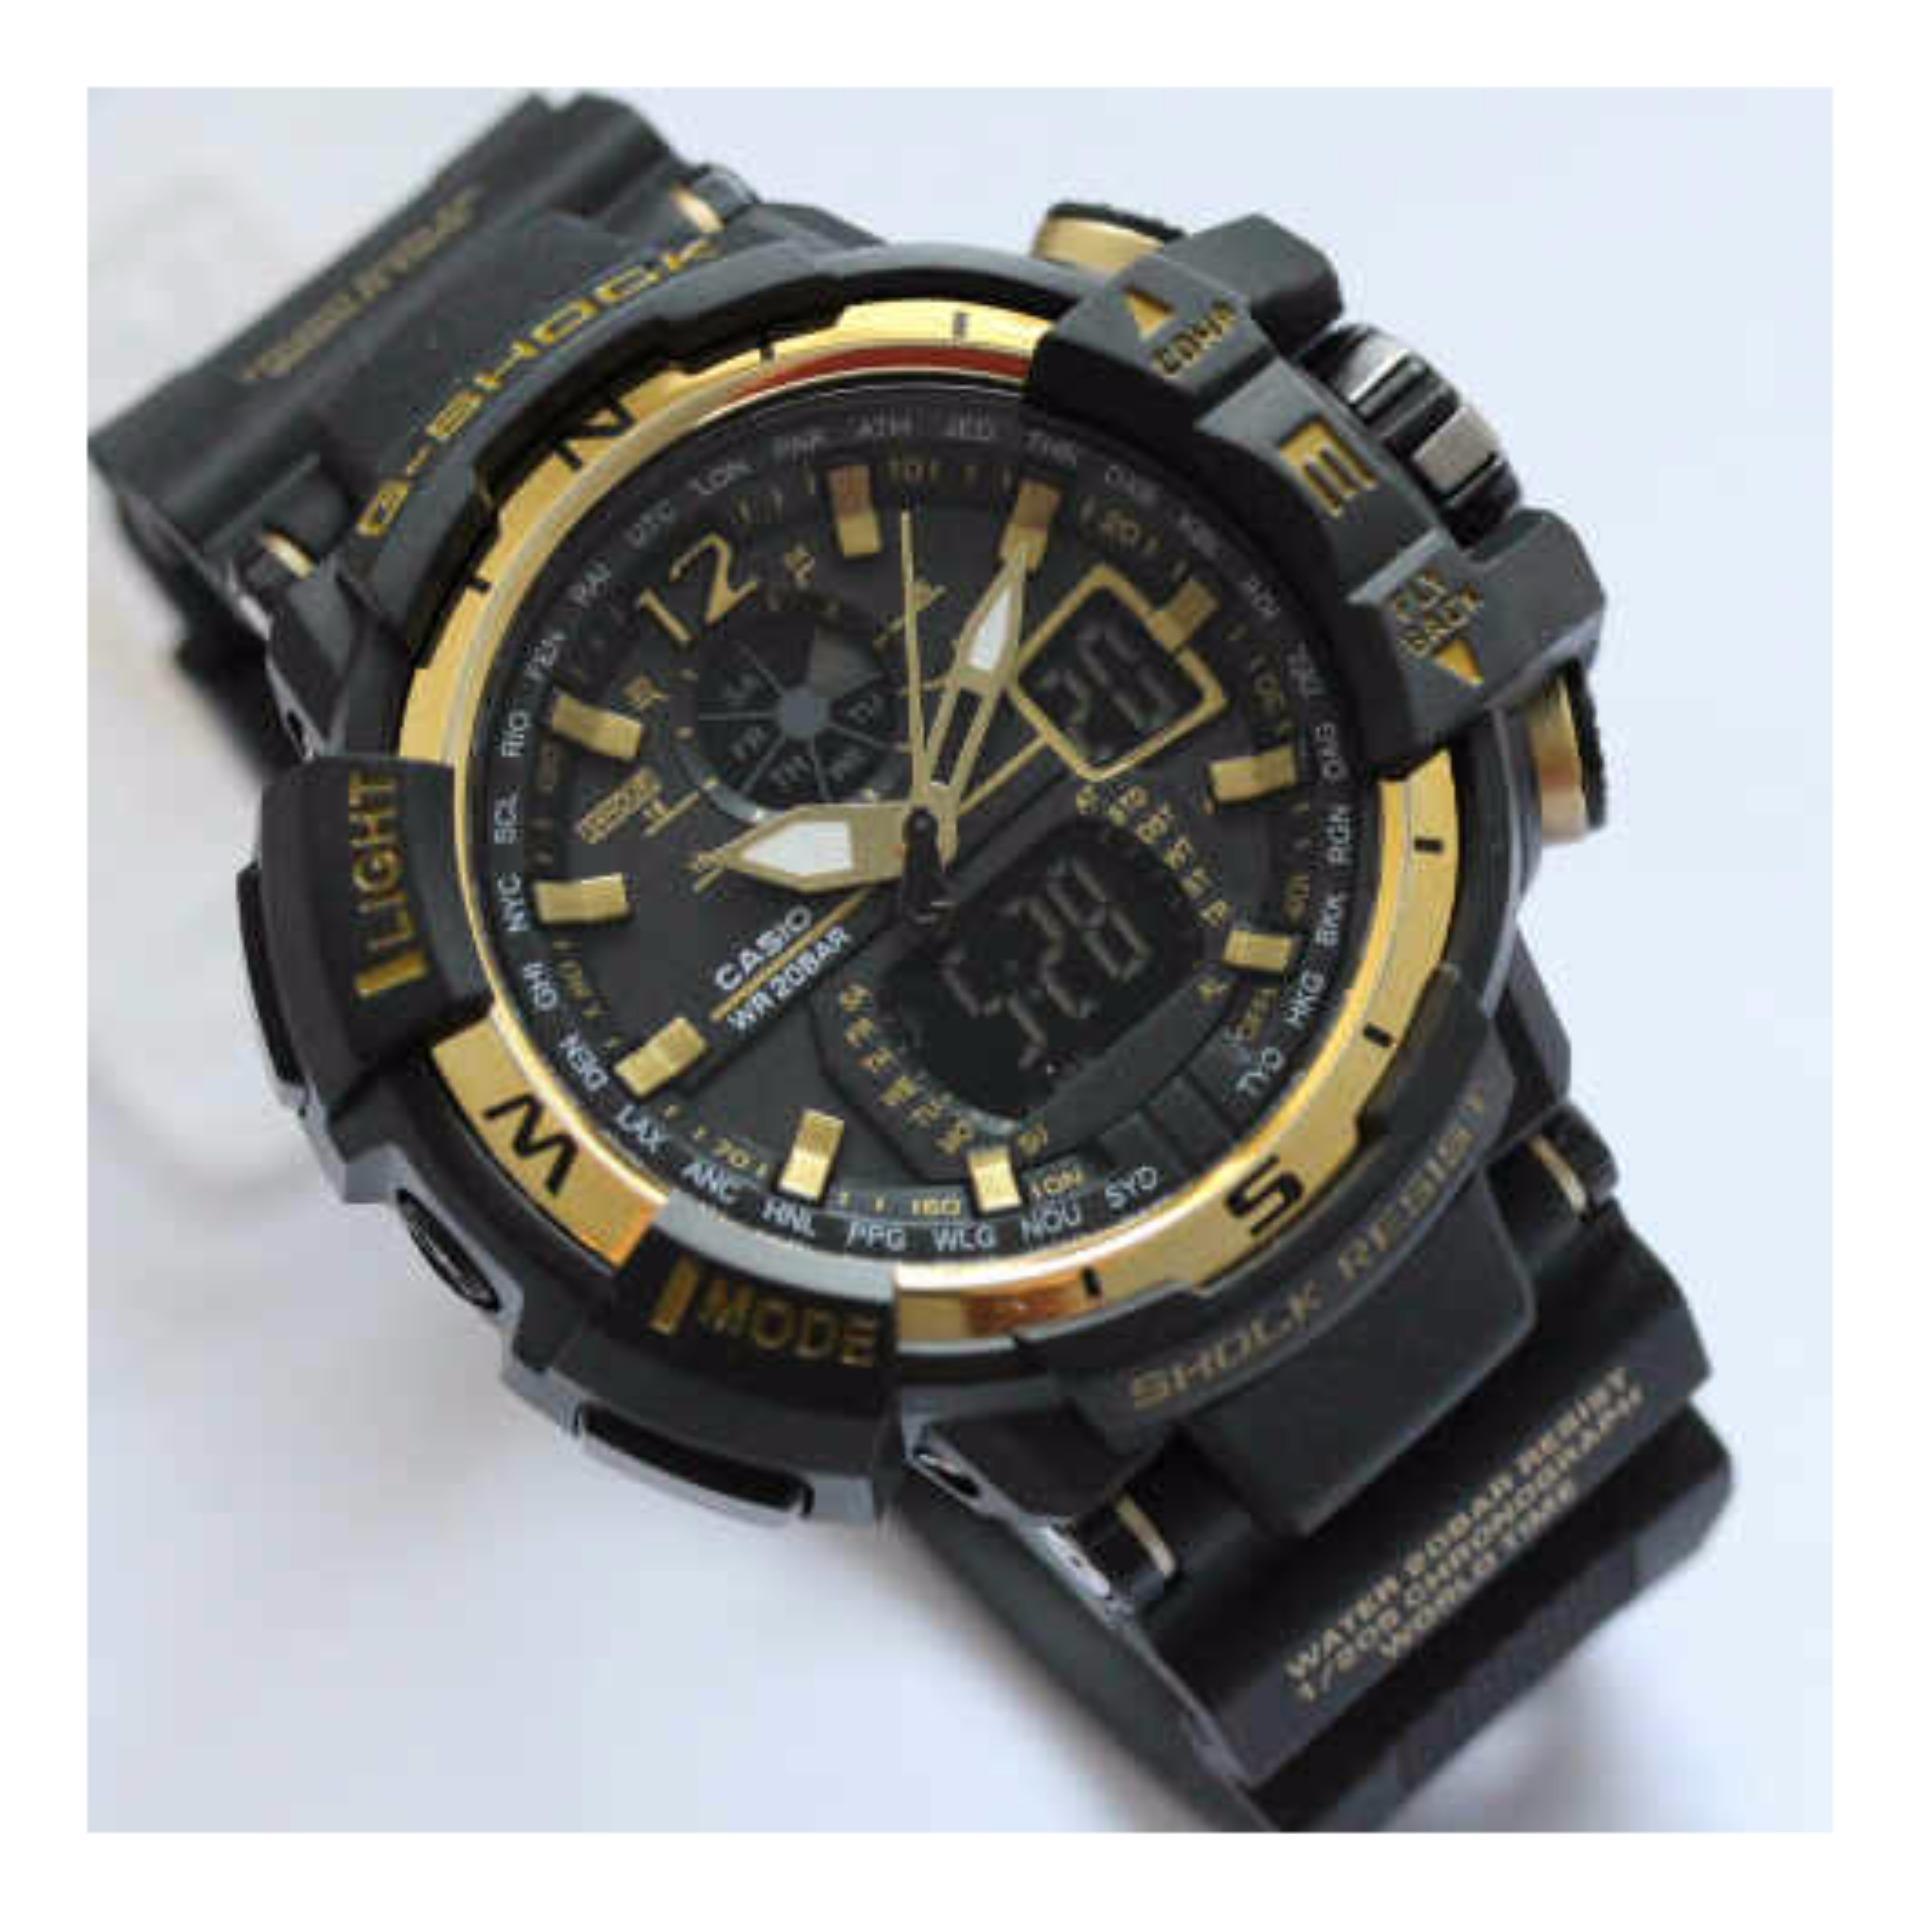 Jam tangan pria GWA 1100 double time